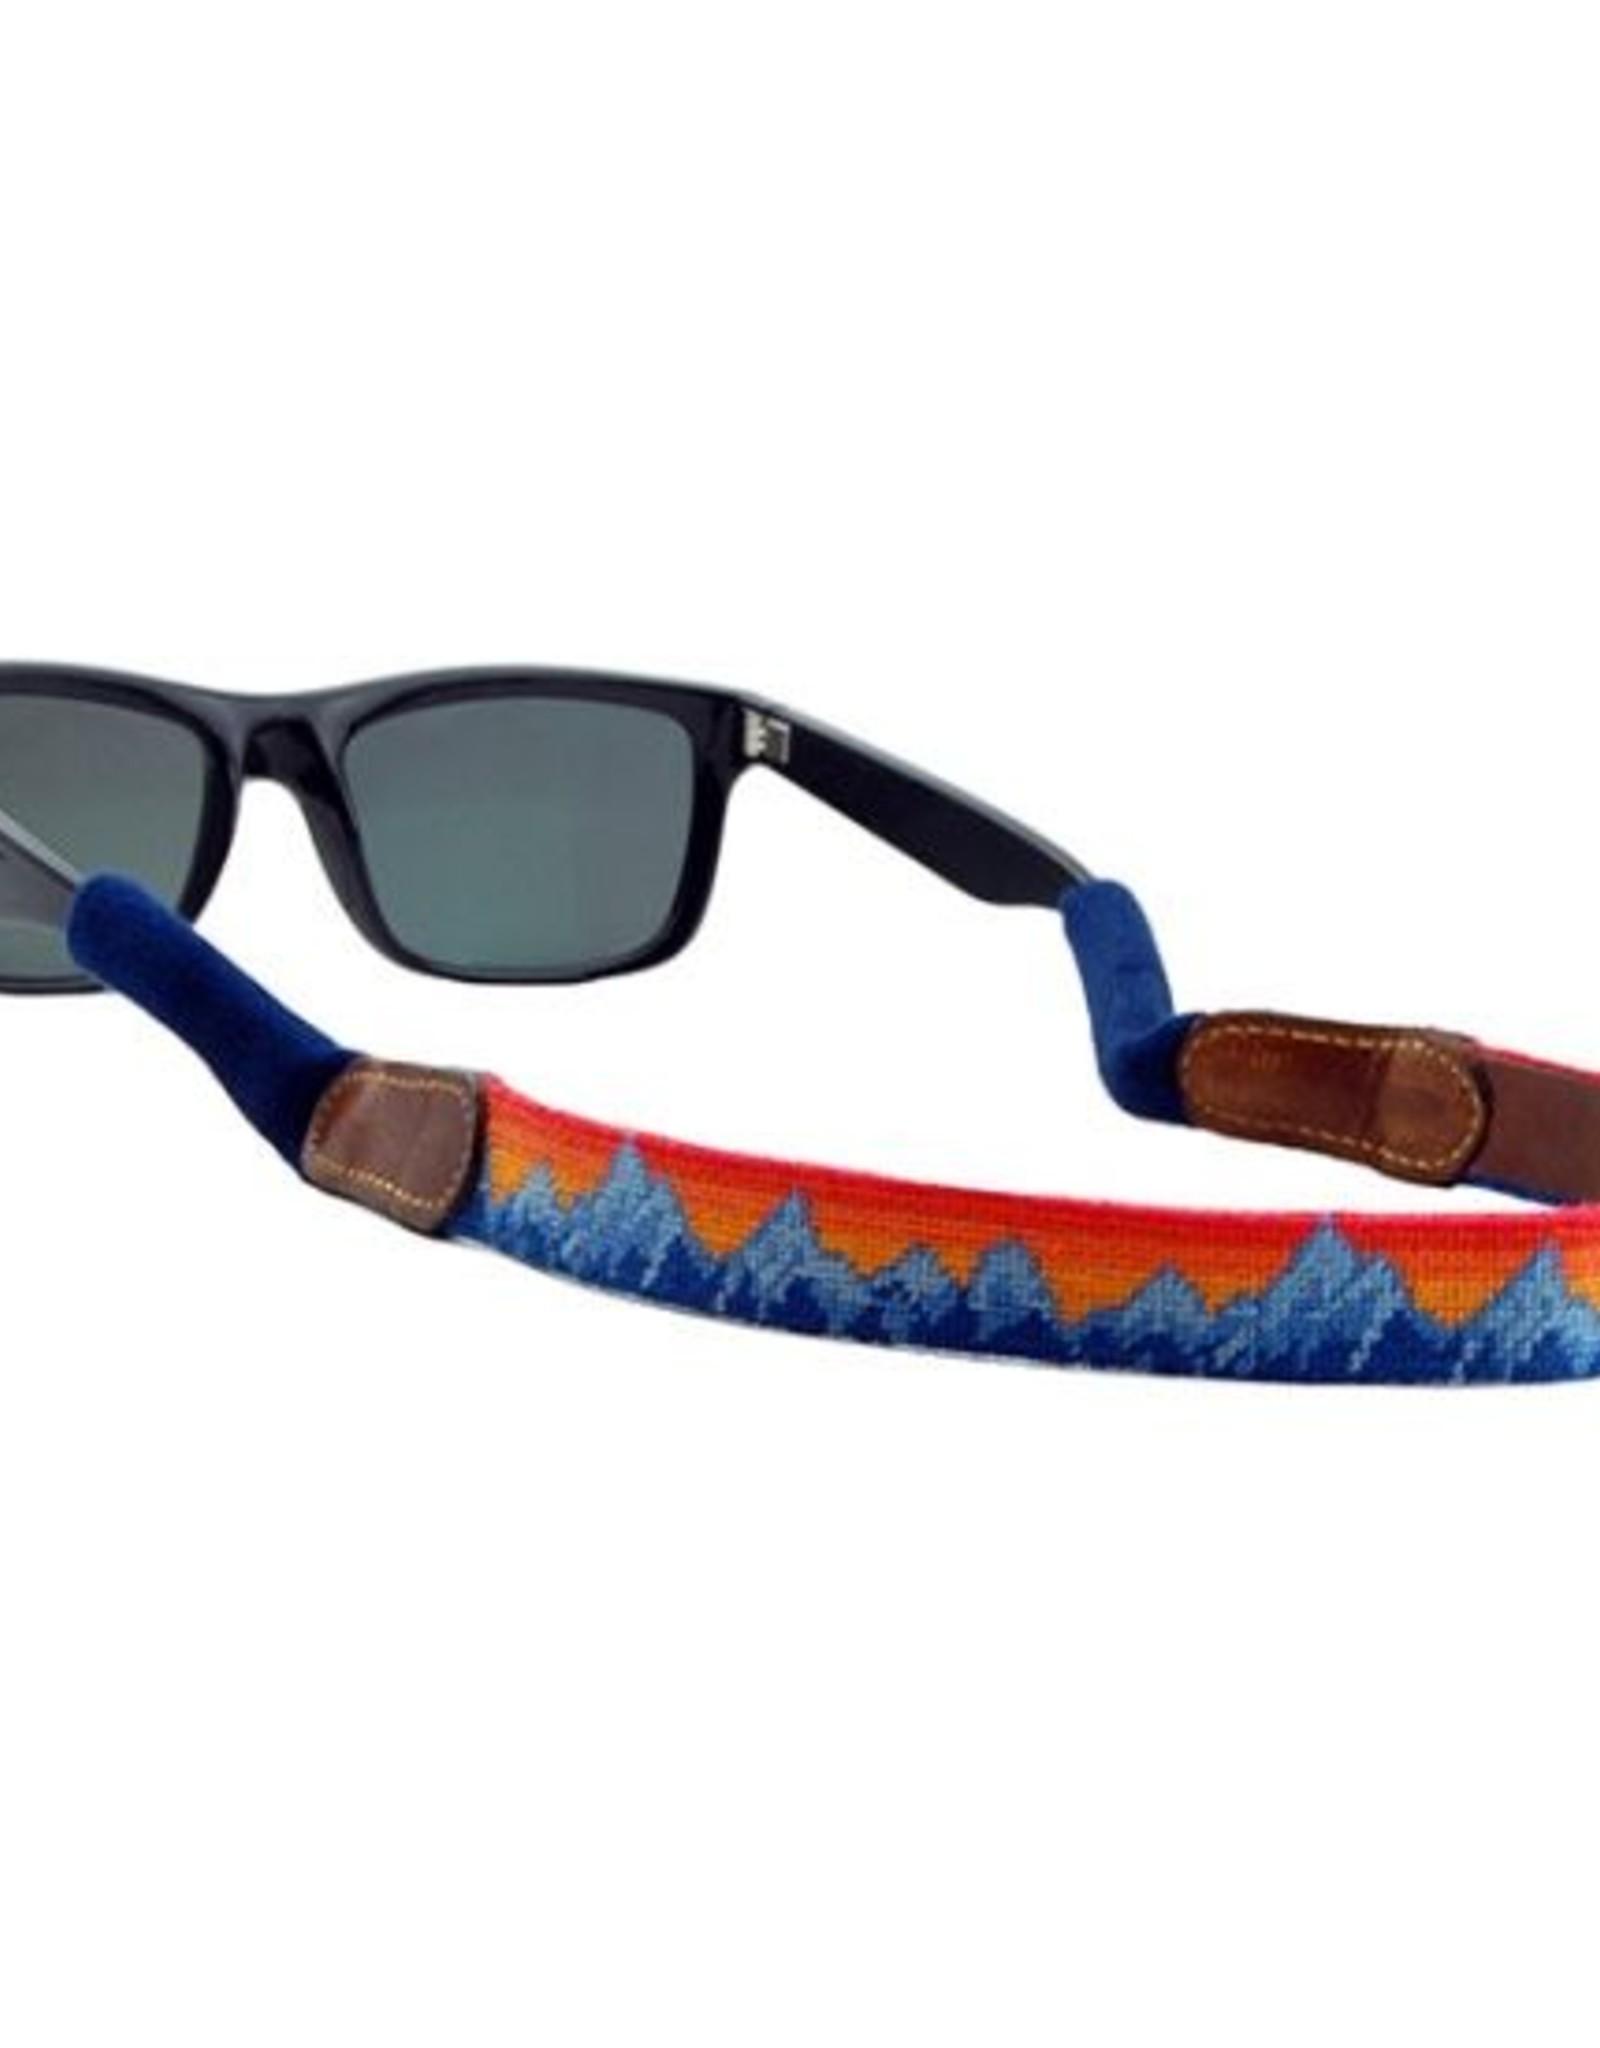 Smathers & Branson Mountain Sunset Needlepoint Sunglass Straps